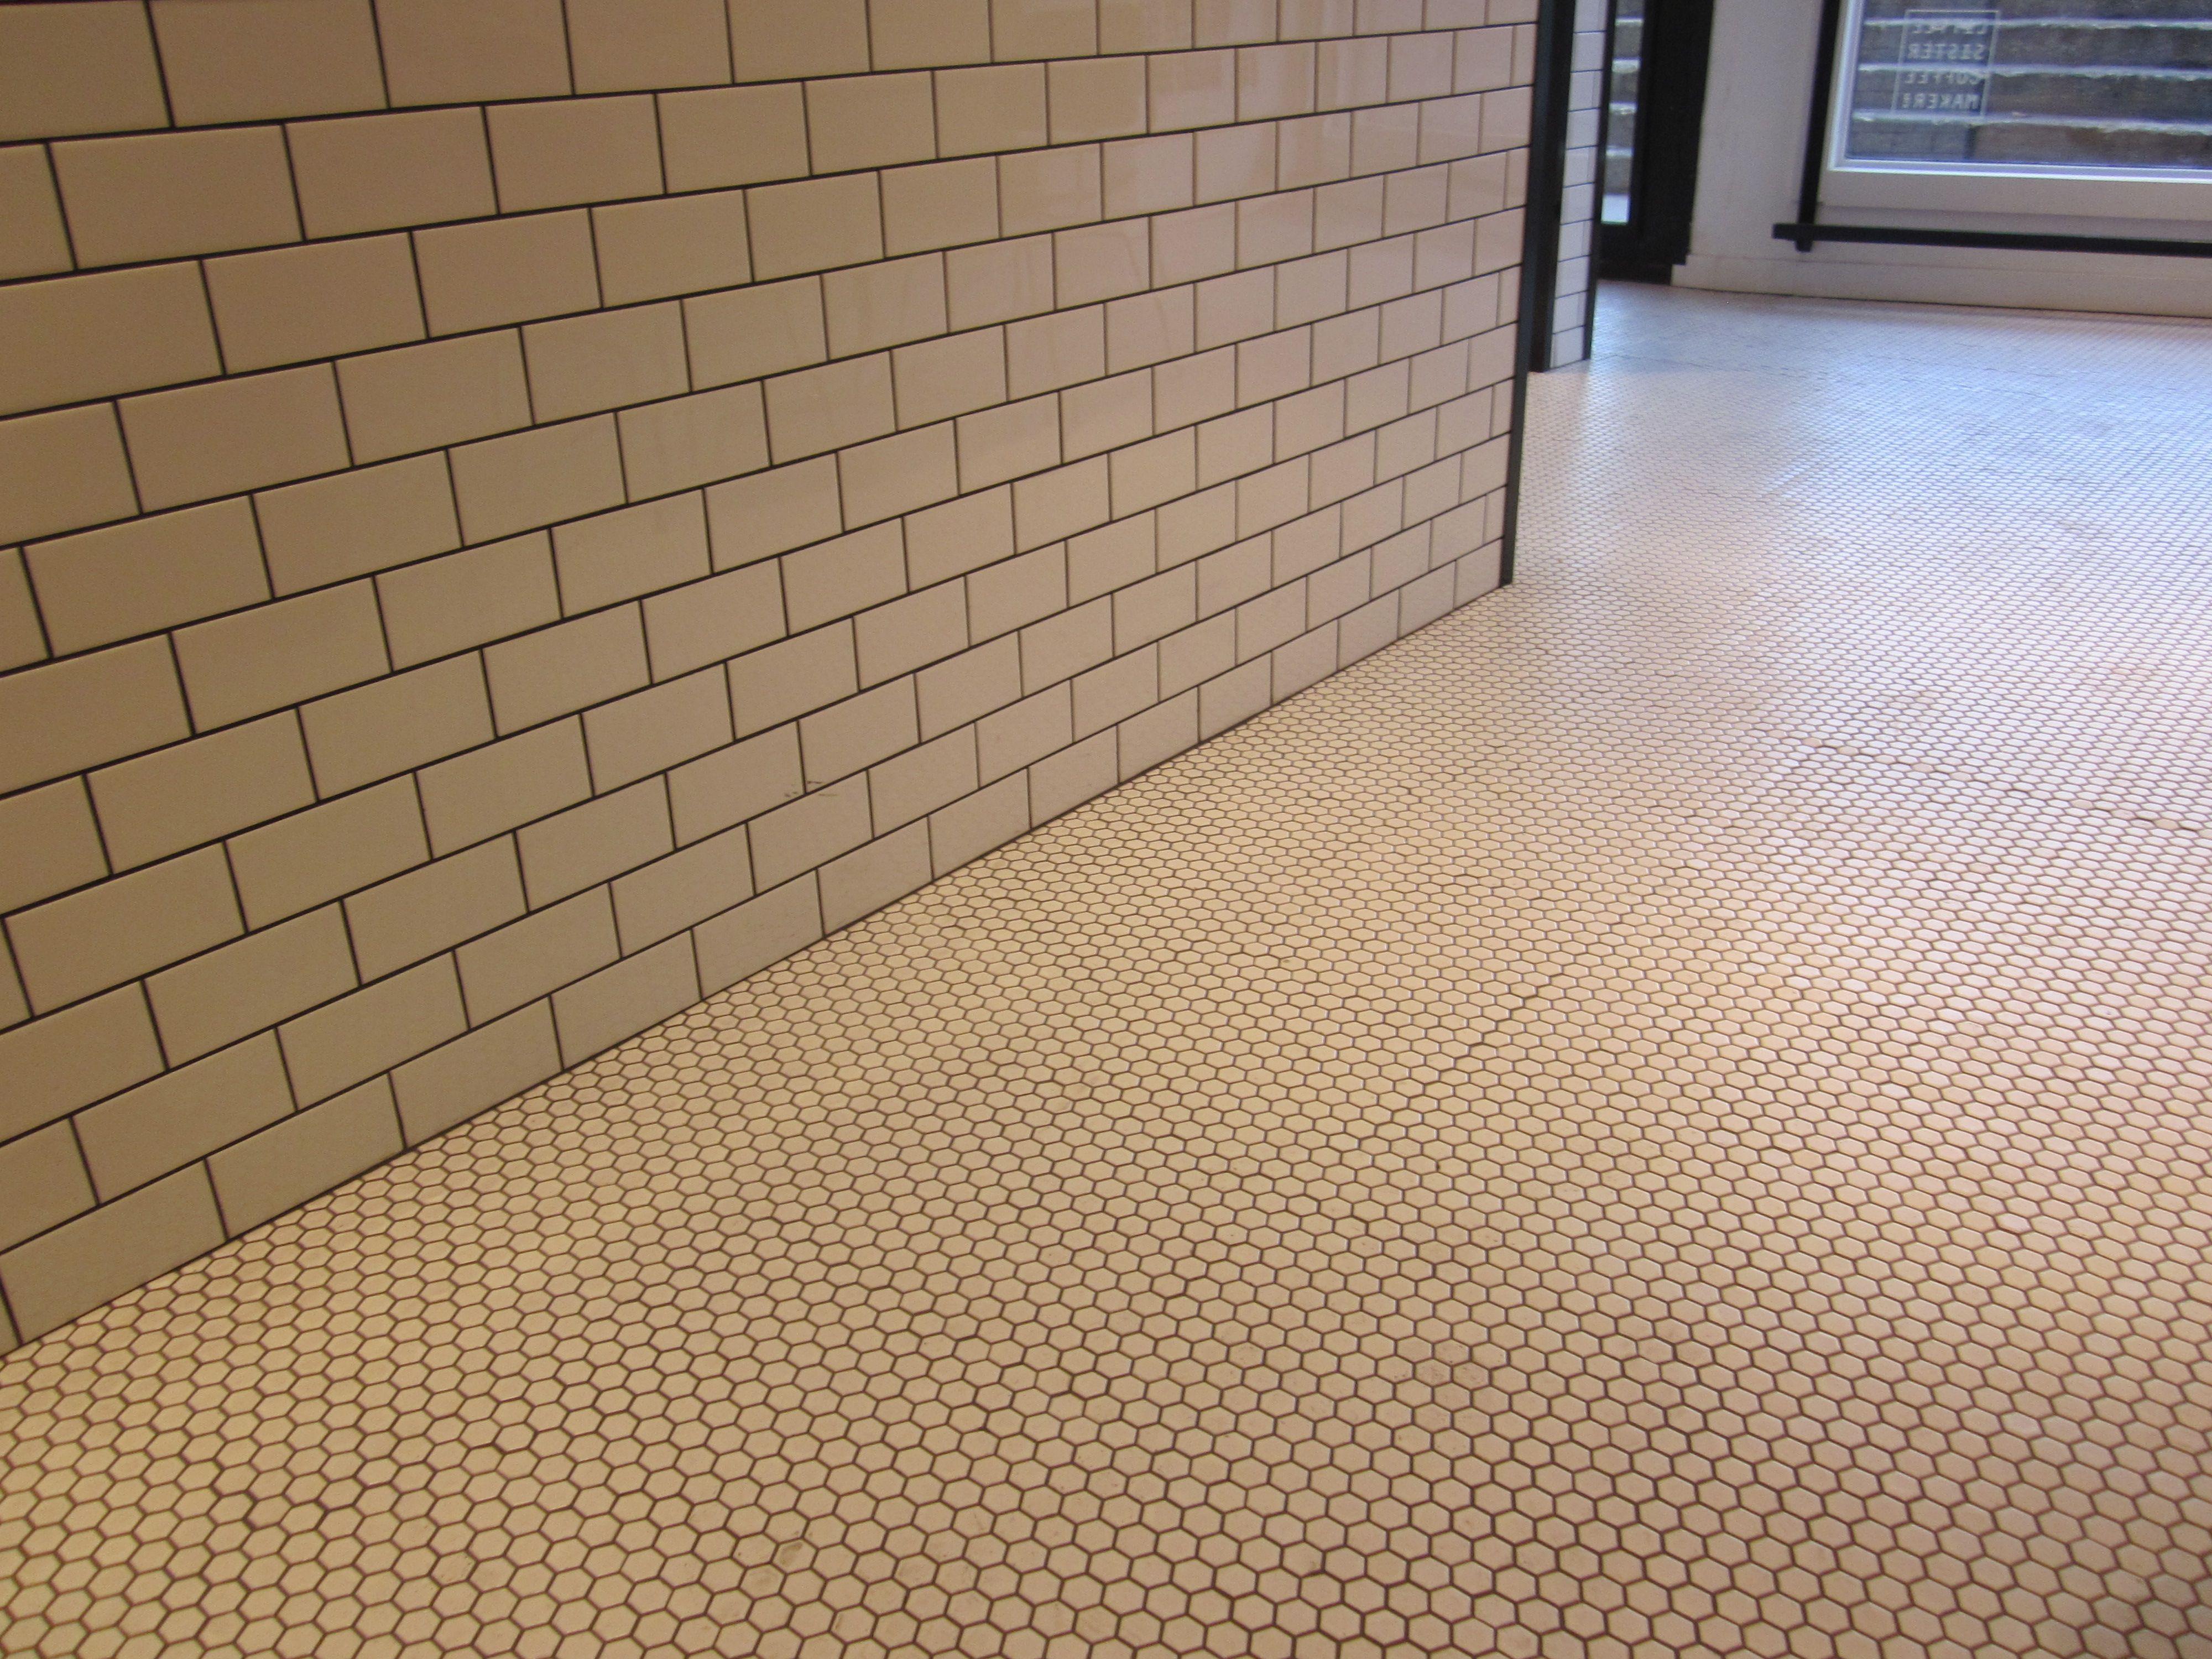 Hospital Floor Tiles  Google Search